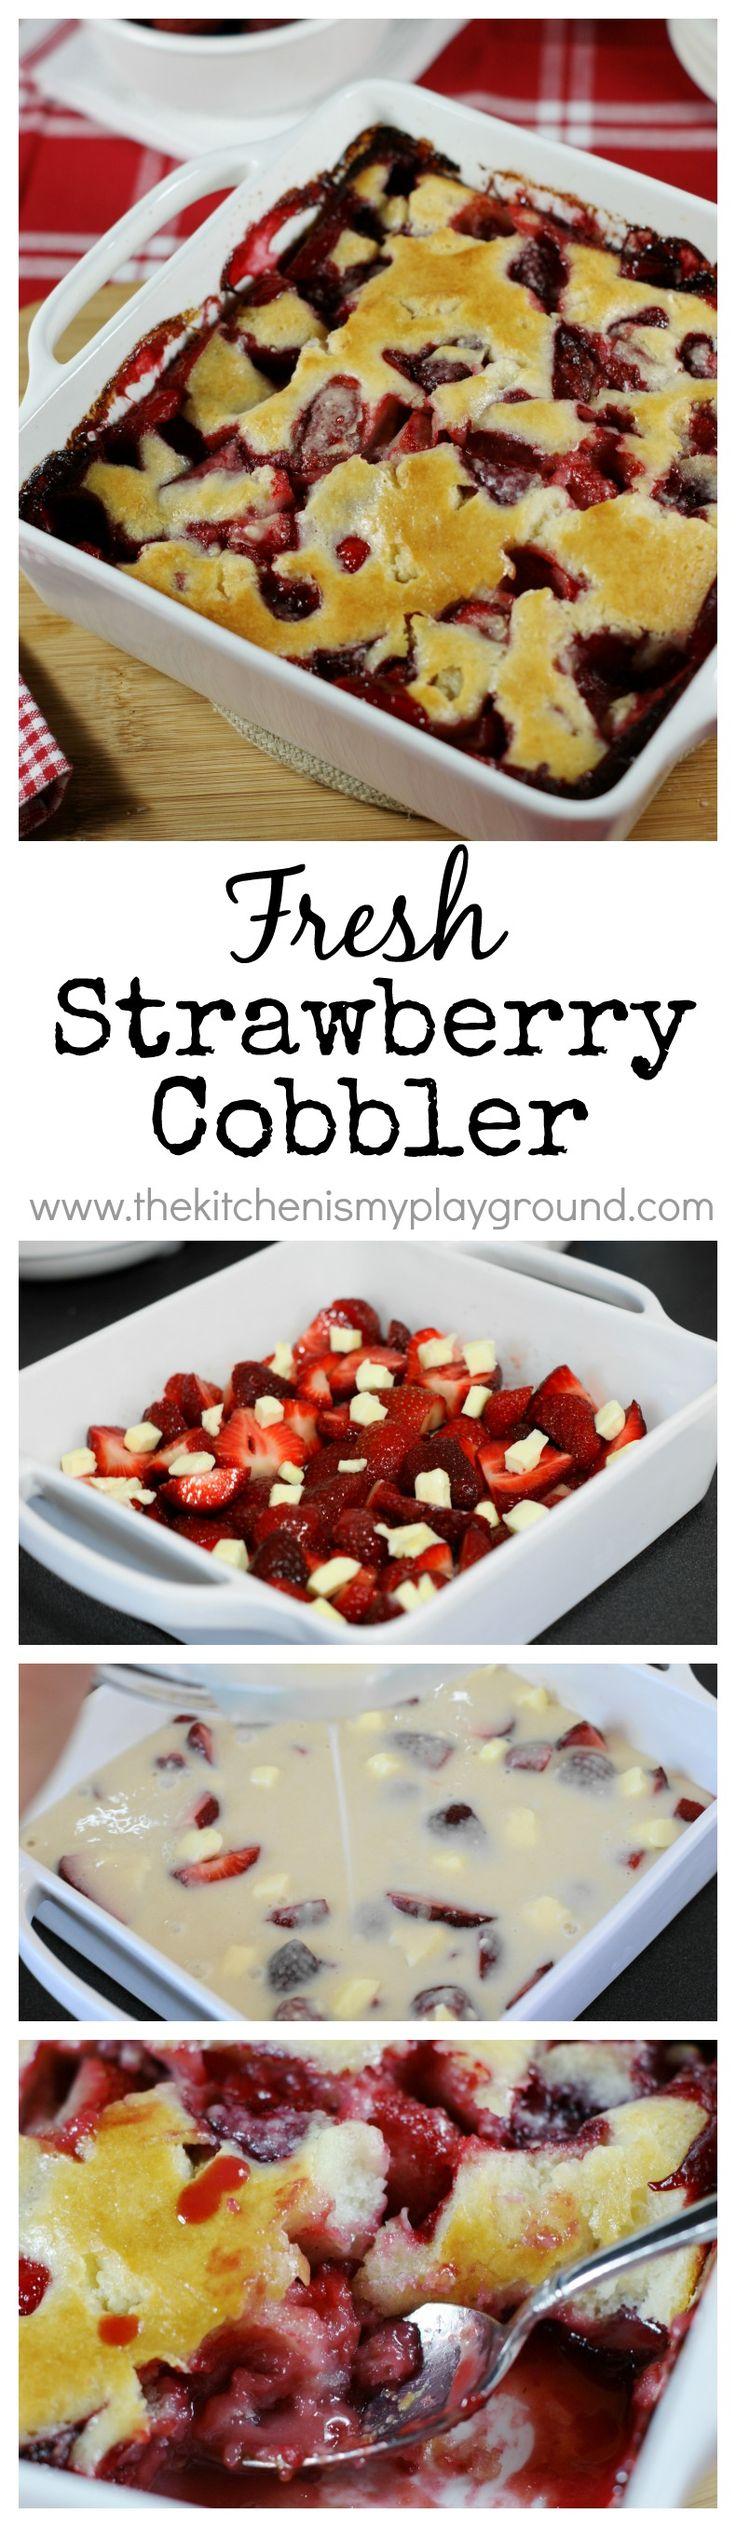 Scrumptious Fresh Strawberry Cobbler   there  39 s just nothing better than juicy fresh strawberries  except for maybe juicy fresh strawberry cobbler  www thekitchenismyplayground com